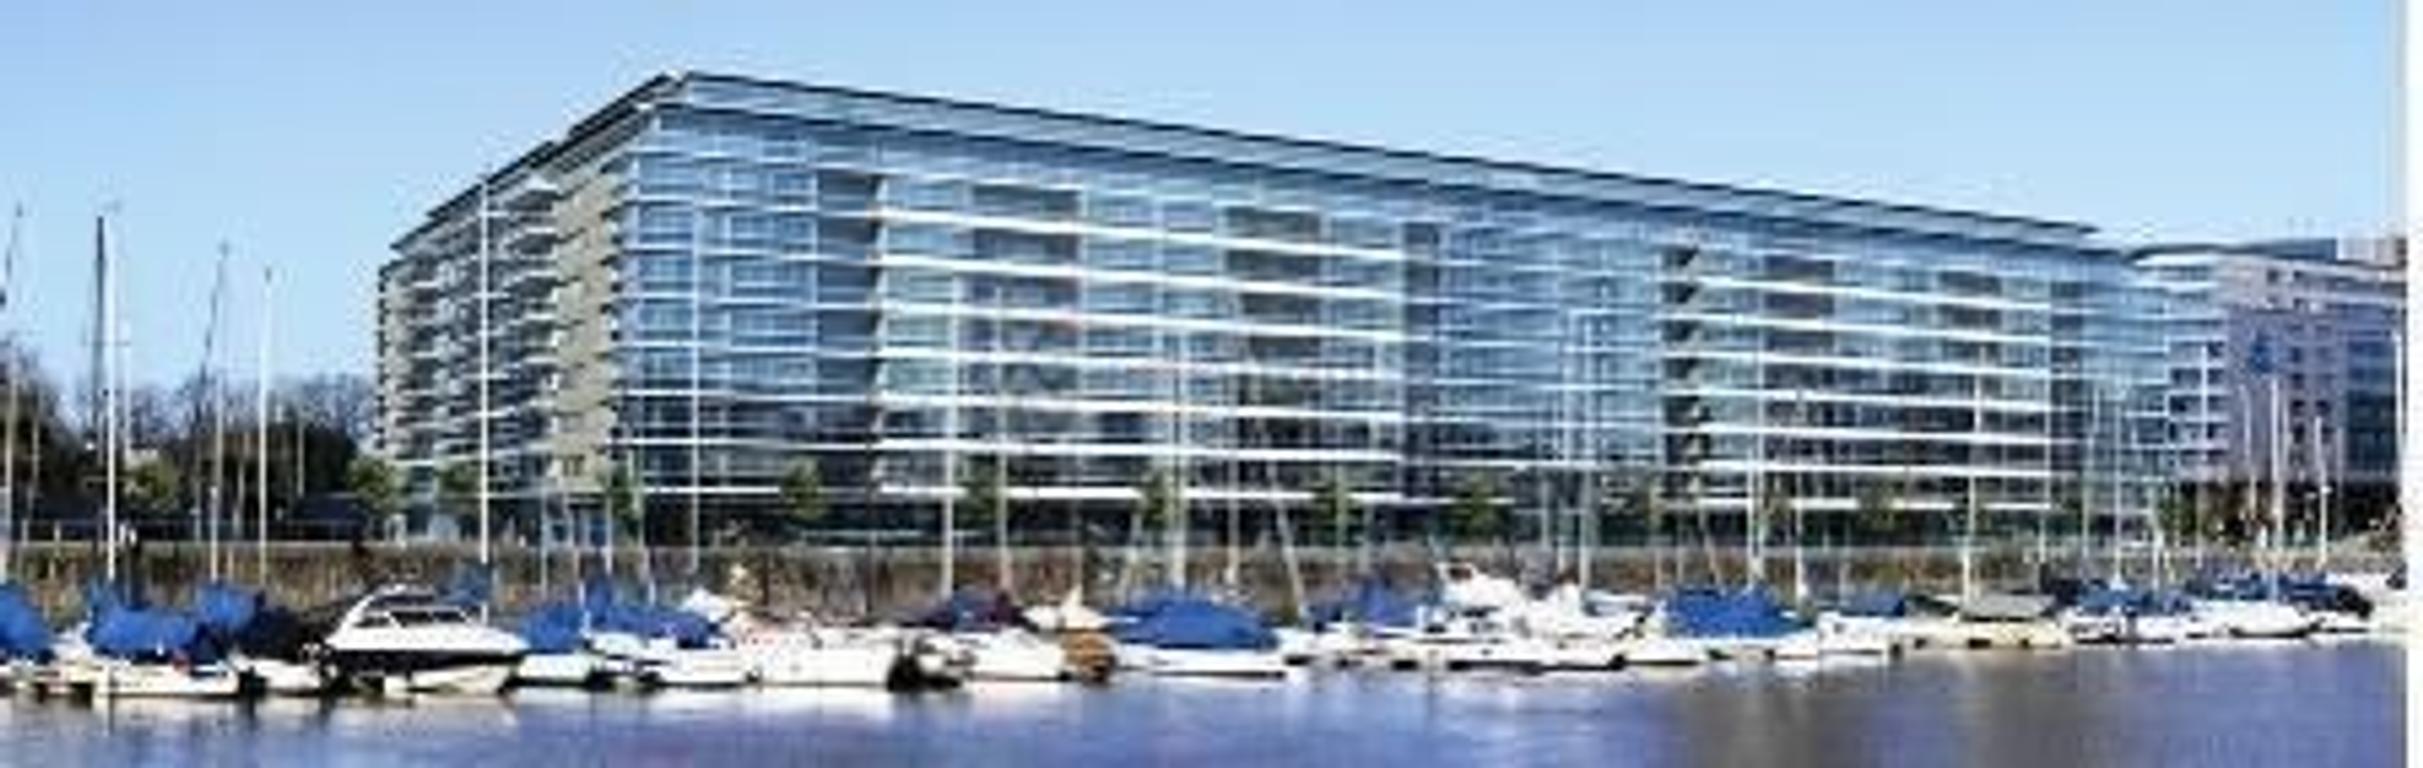 Alquiler 3 Ambientes Macacha Güemes 300 - Puerto Madero - Capital Federal